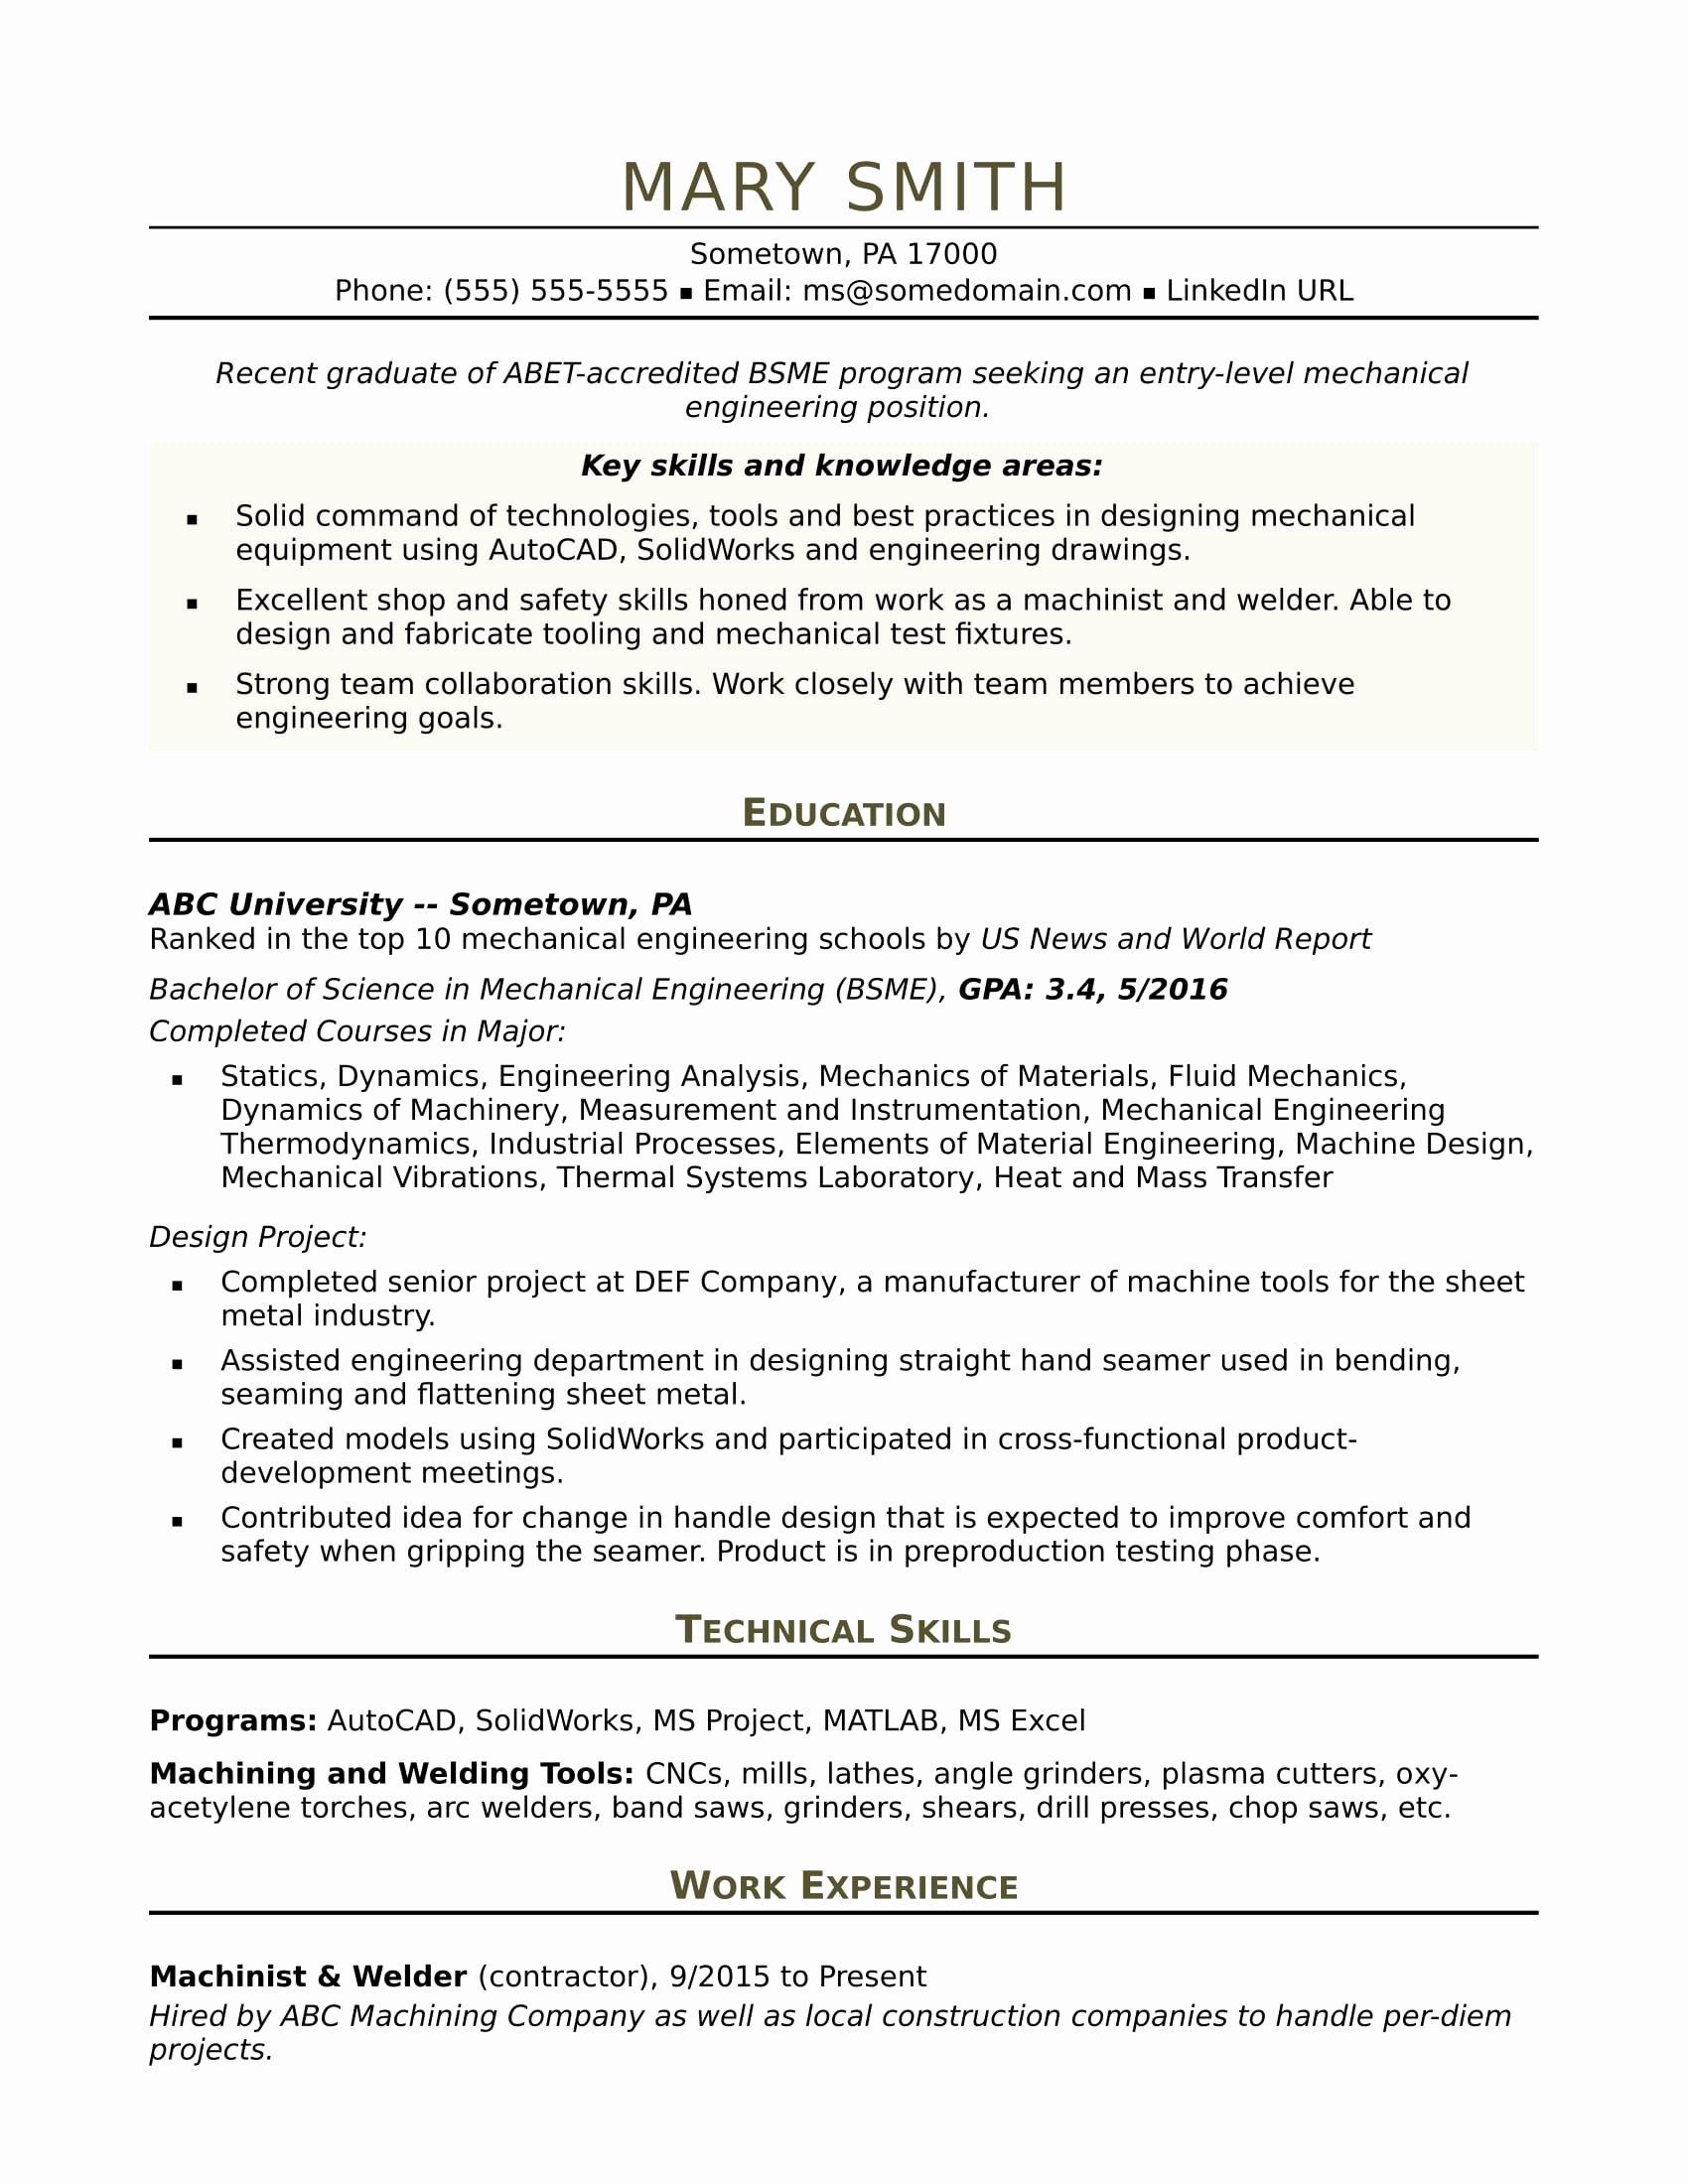 Mechanical Engineer Resume Template Best Of Sample Resume for An Entry Level Mechanical Engineer